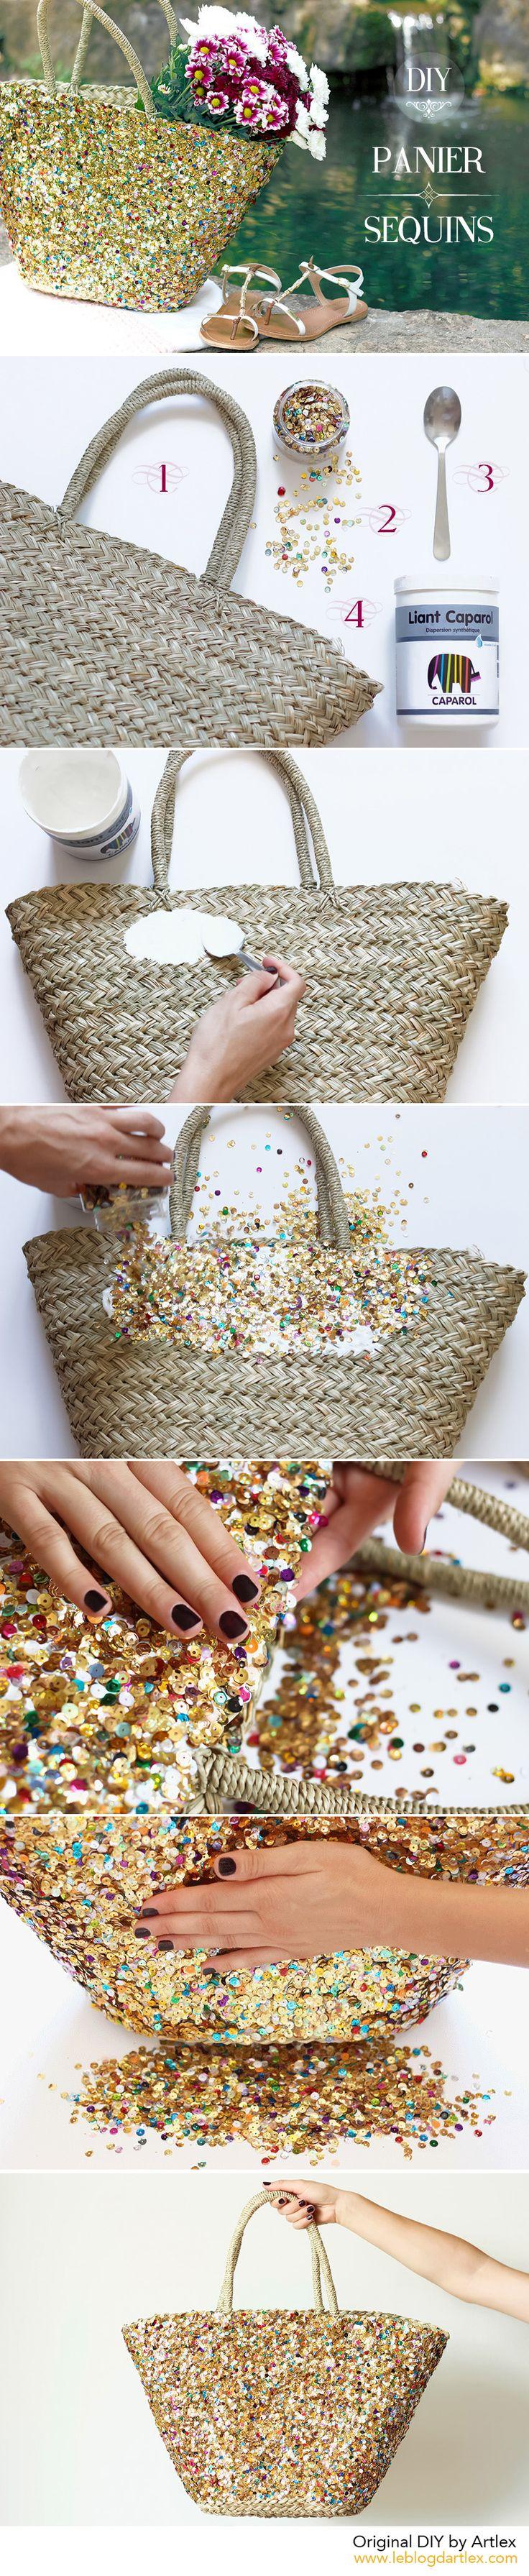 DIY panier sequins / DIY panier paillettes / DIY cabas plage - Blog mode & DIY Artlex